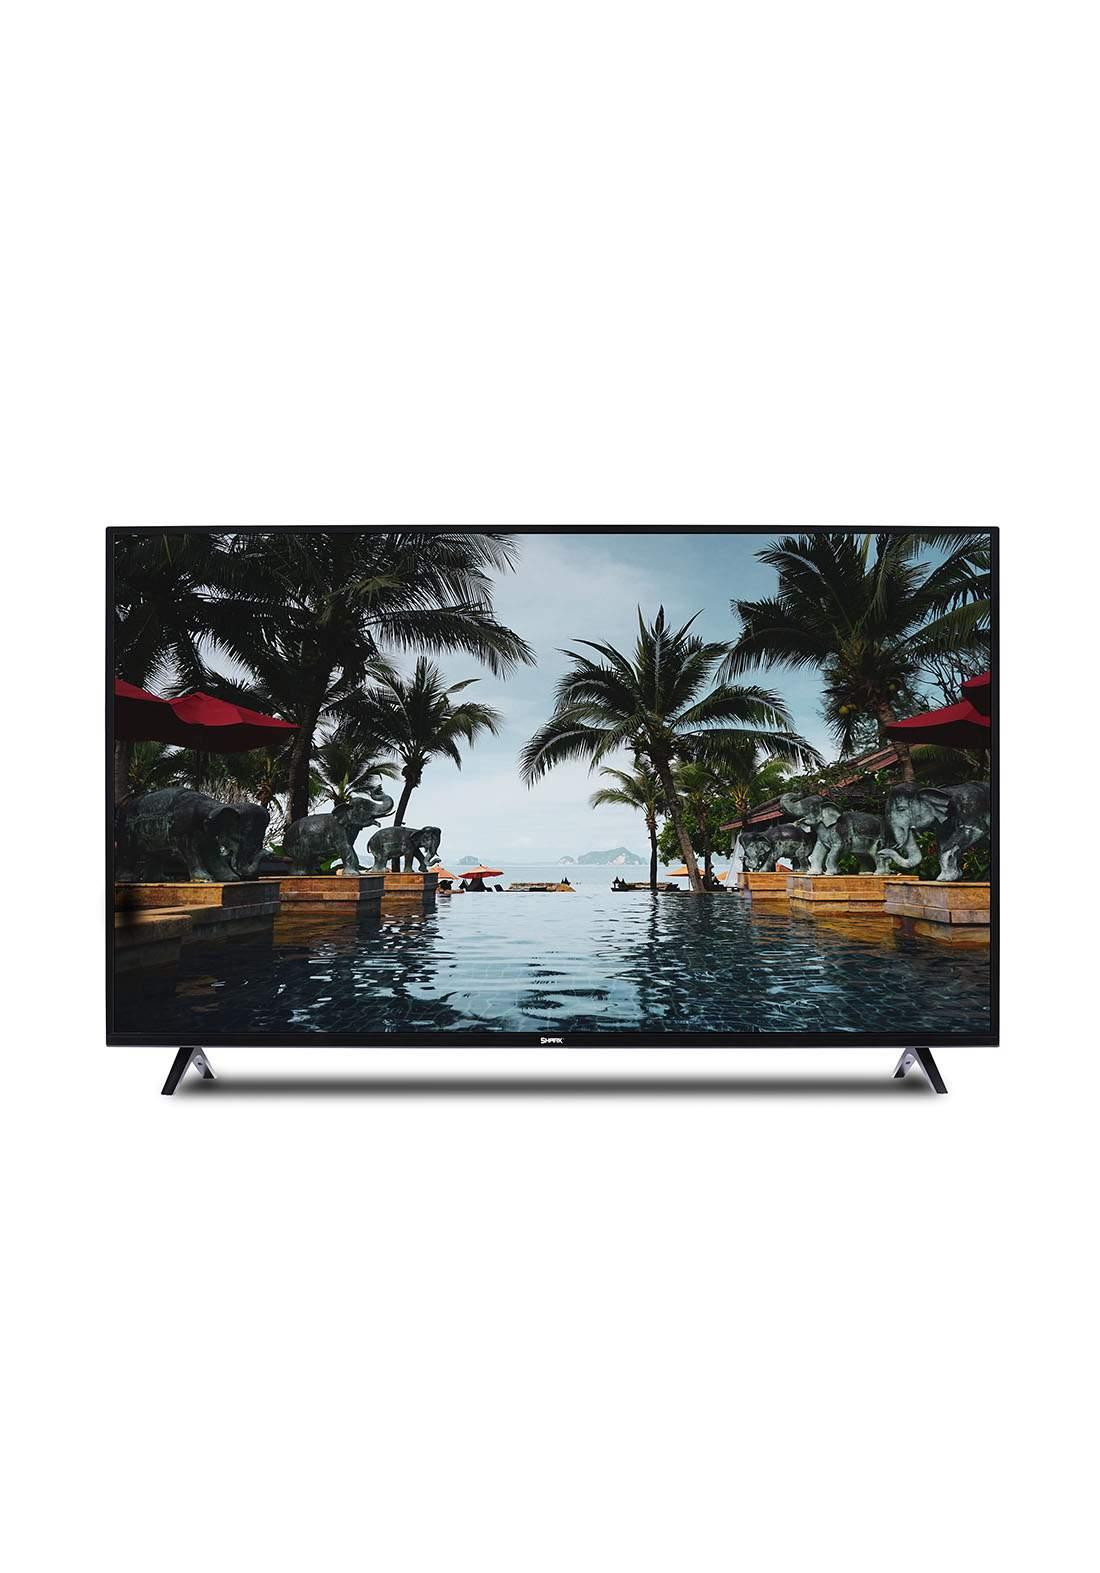 Shark Smart Led Tv - 75inch 4K شاشة ذكية